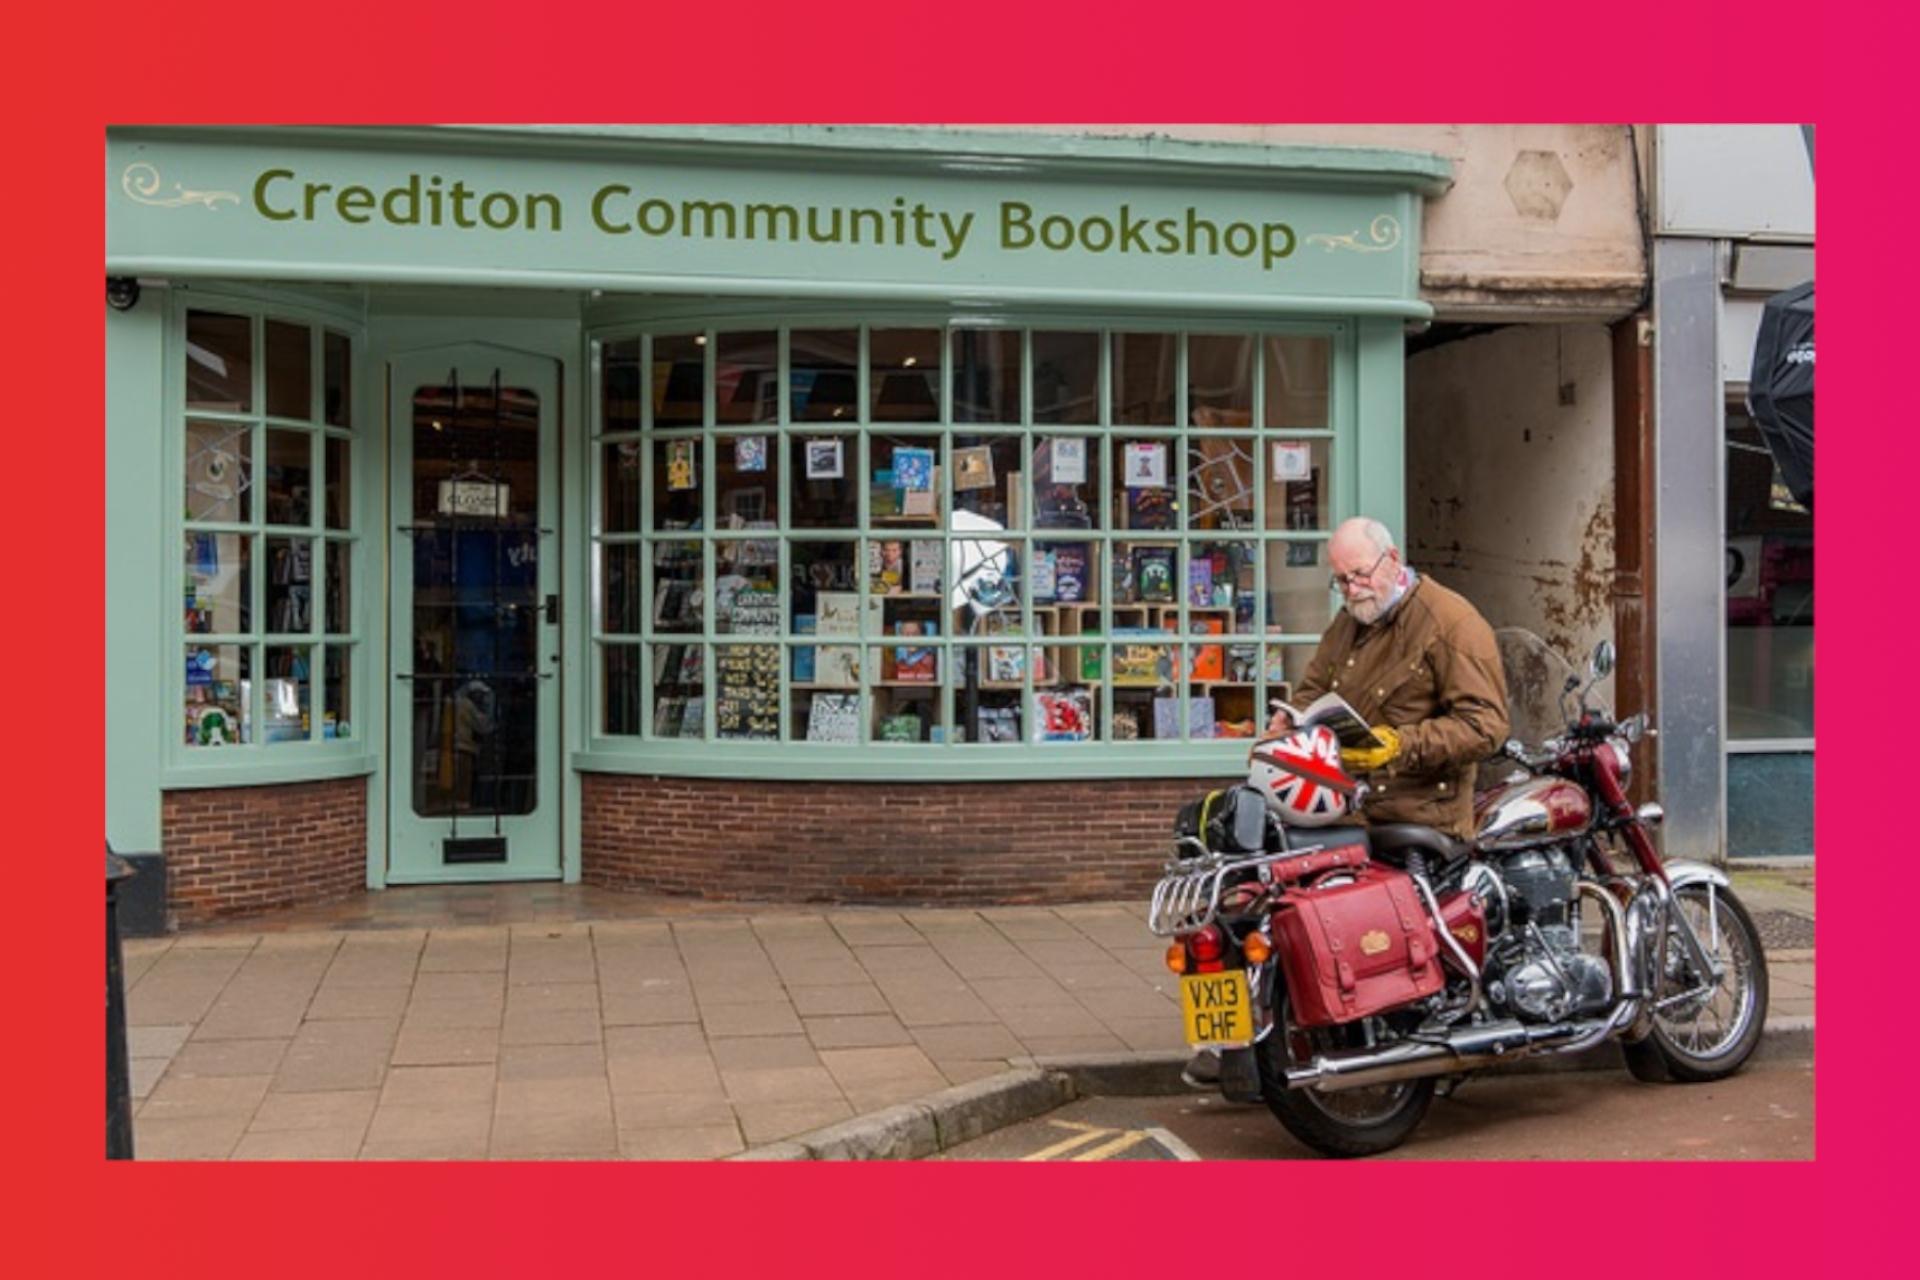 LoveReading Bookshop of the Month: Crediton Community Bookshop